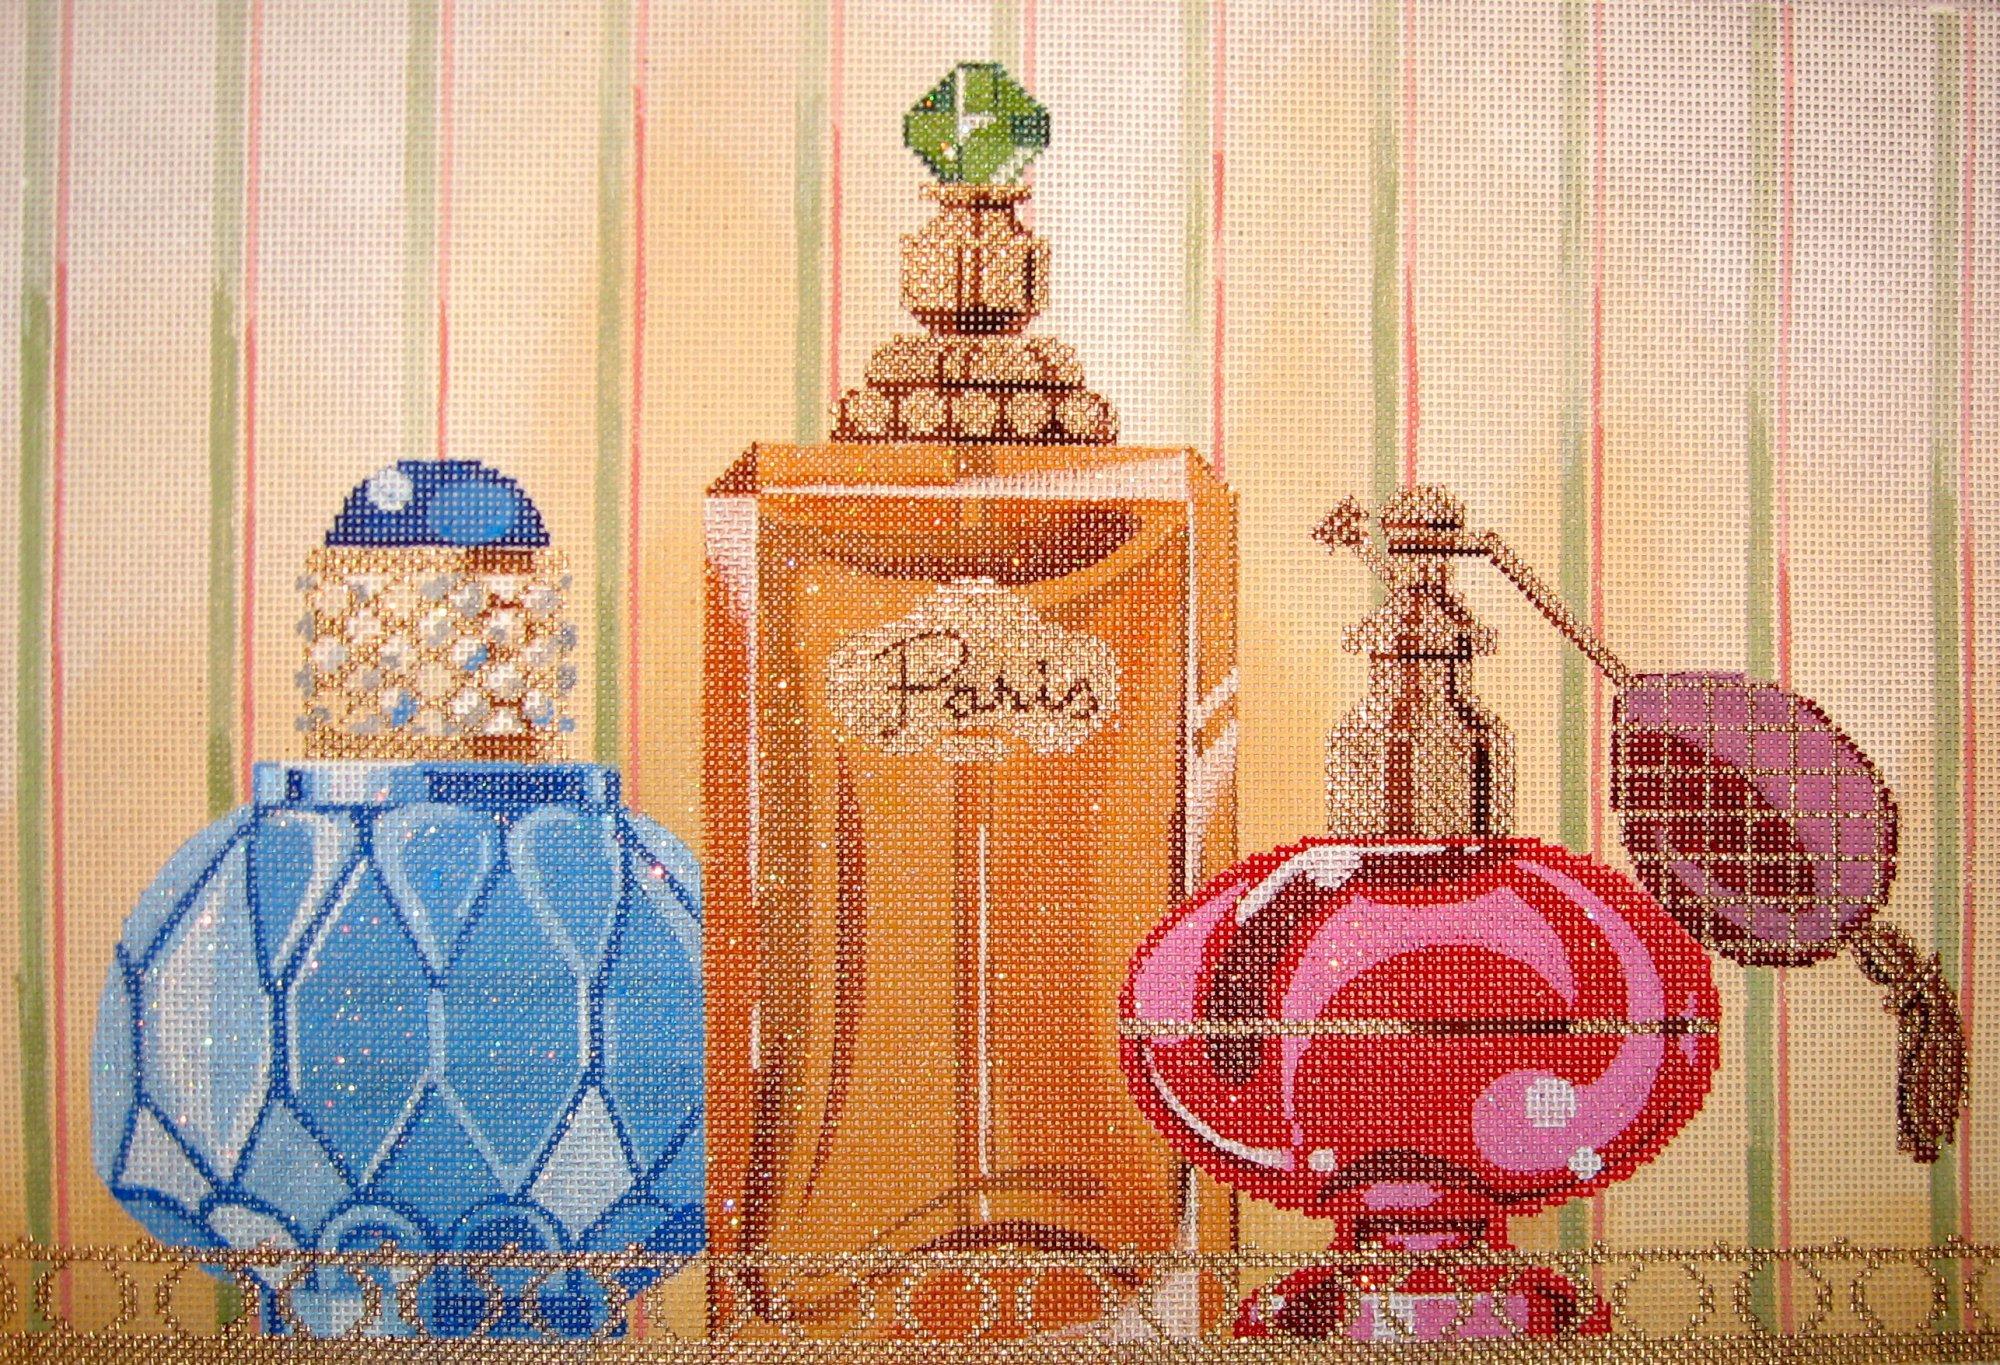 Perfume Bottles on Tray (18 mesh)